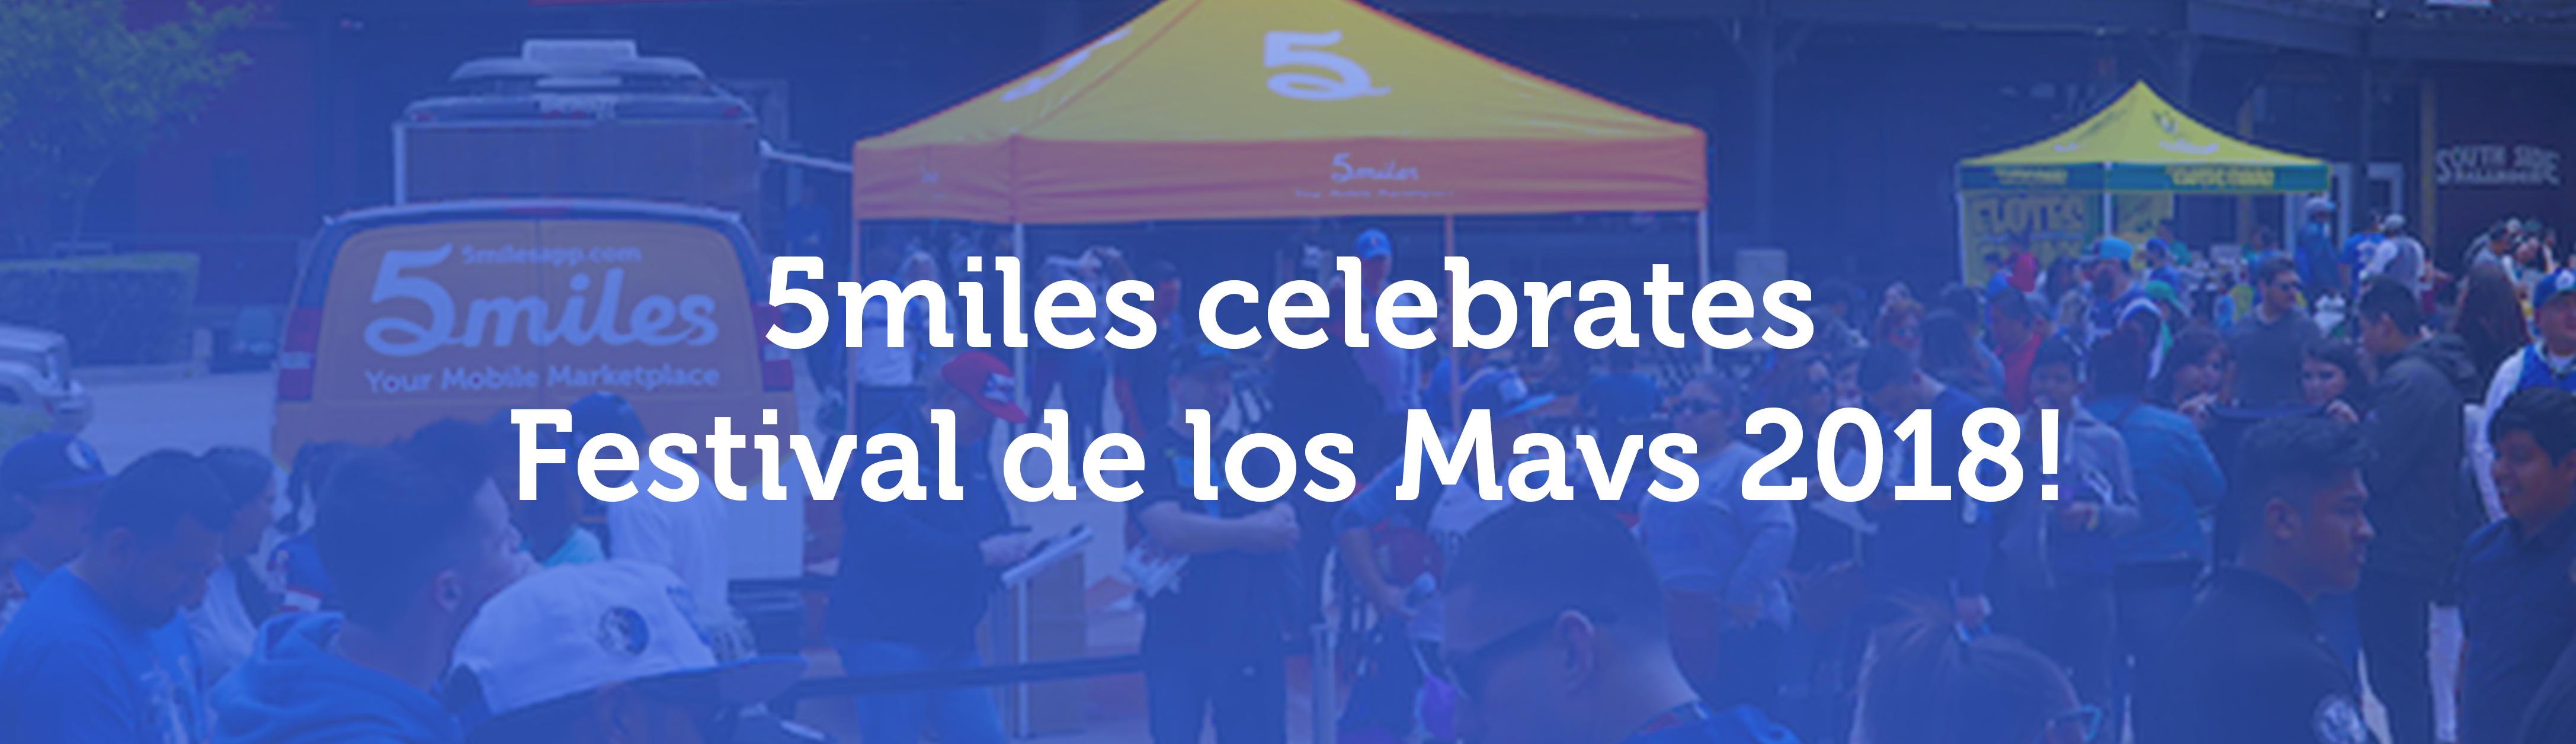 Festival De Los Mavs! 5miles celebrates Hispanic Heritage